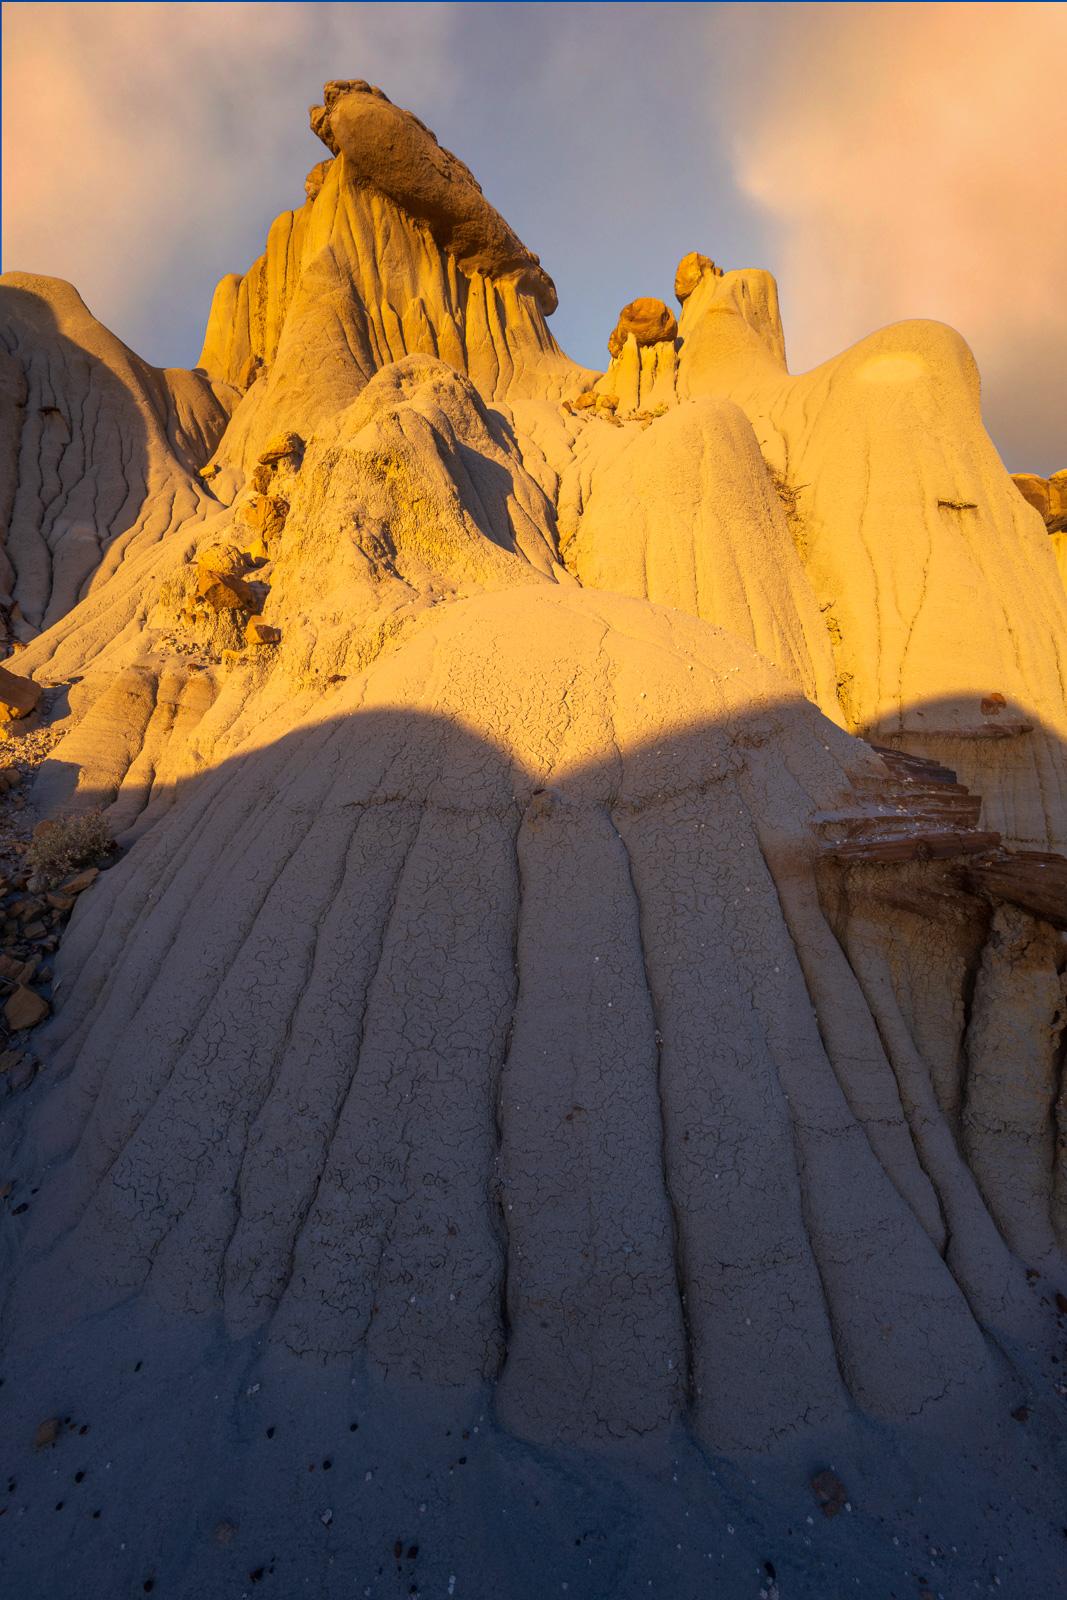 Eroding badlands at sunset in Makoshika State Park, Wyoming.